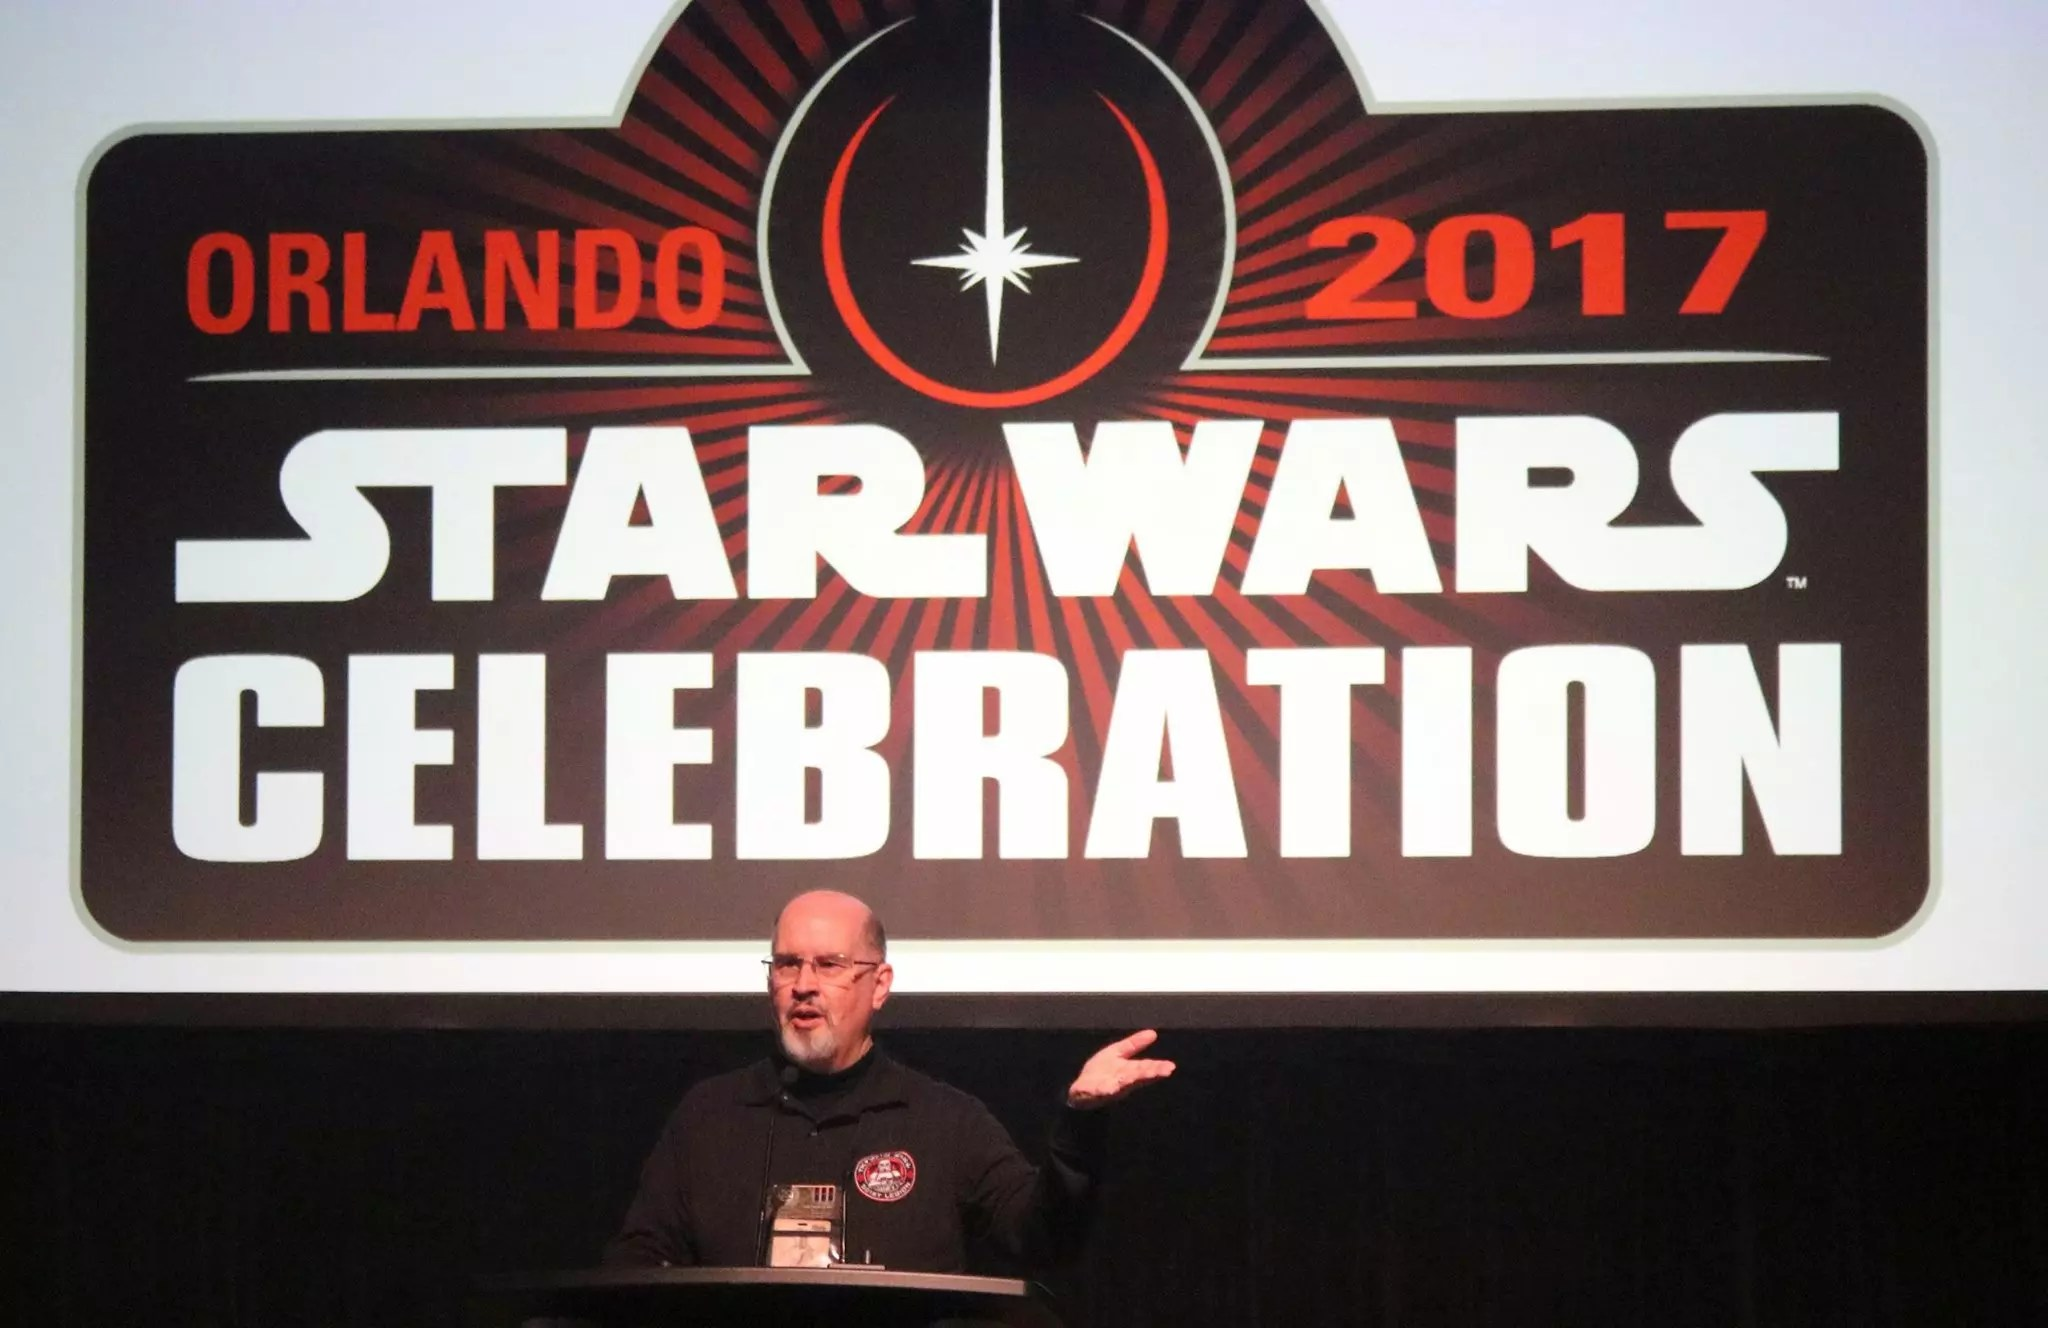 Legendary Star Wars novelist, Timothy Zahn, teaches a writing seminar at Celebration Orlando.